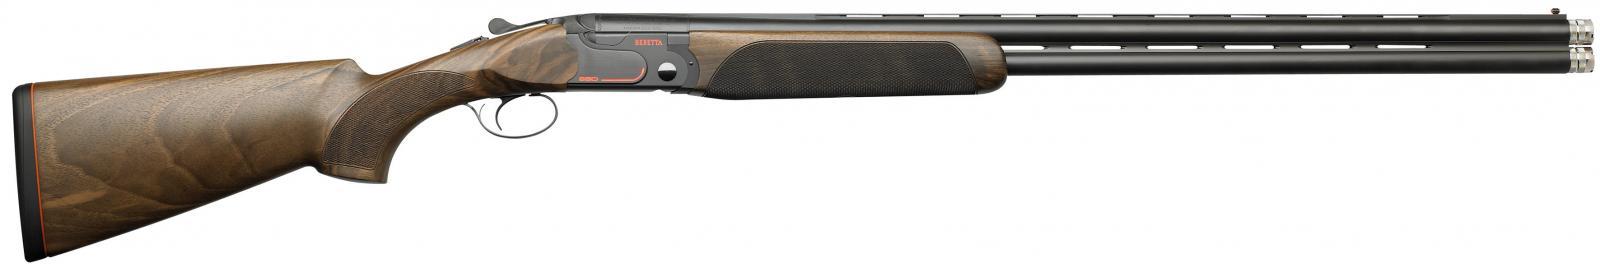 Fusil superposé BERETTA 690 COMP SPORTING  Black Édition Canon 76